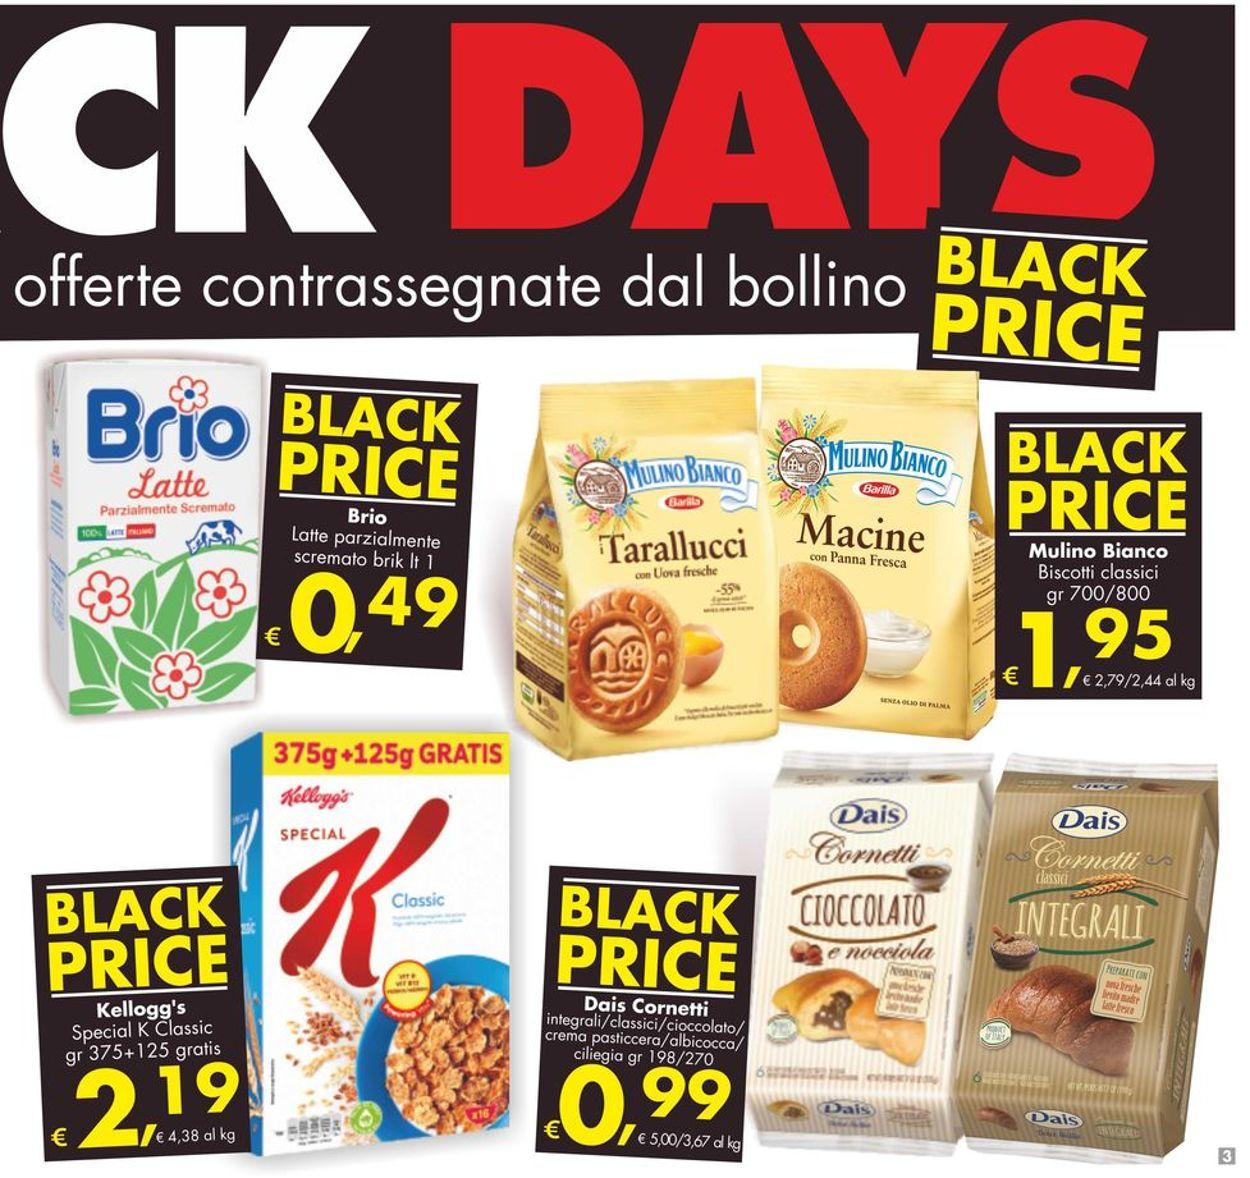 Volantino Deco - Black Friday 2019 - Offerte 29/11-05/12/2019 (Pagina 3)